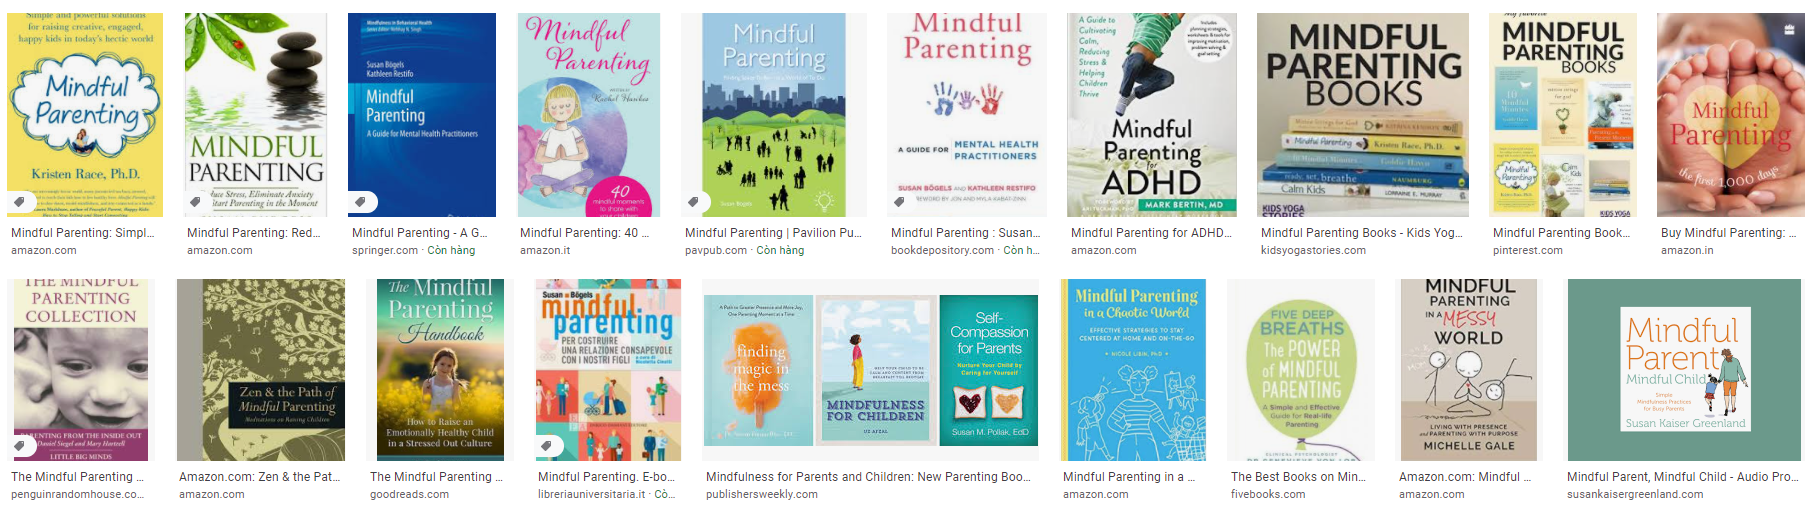 Mindful Parenting Books